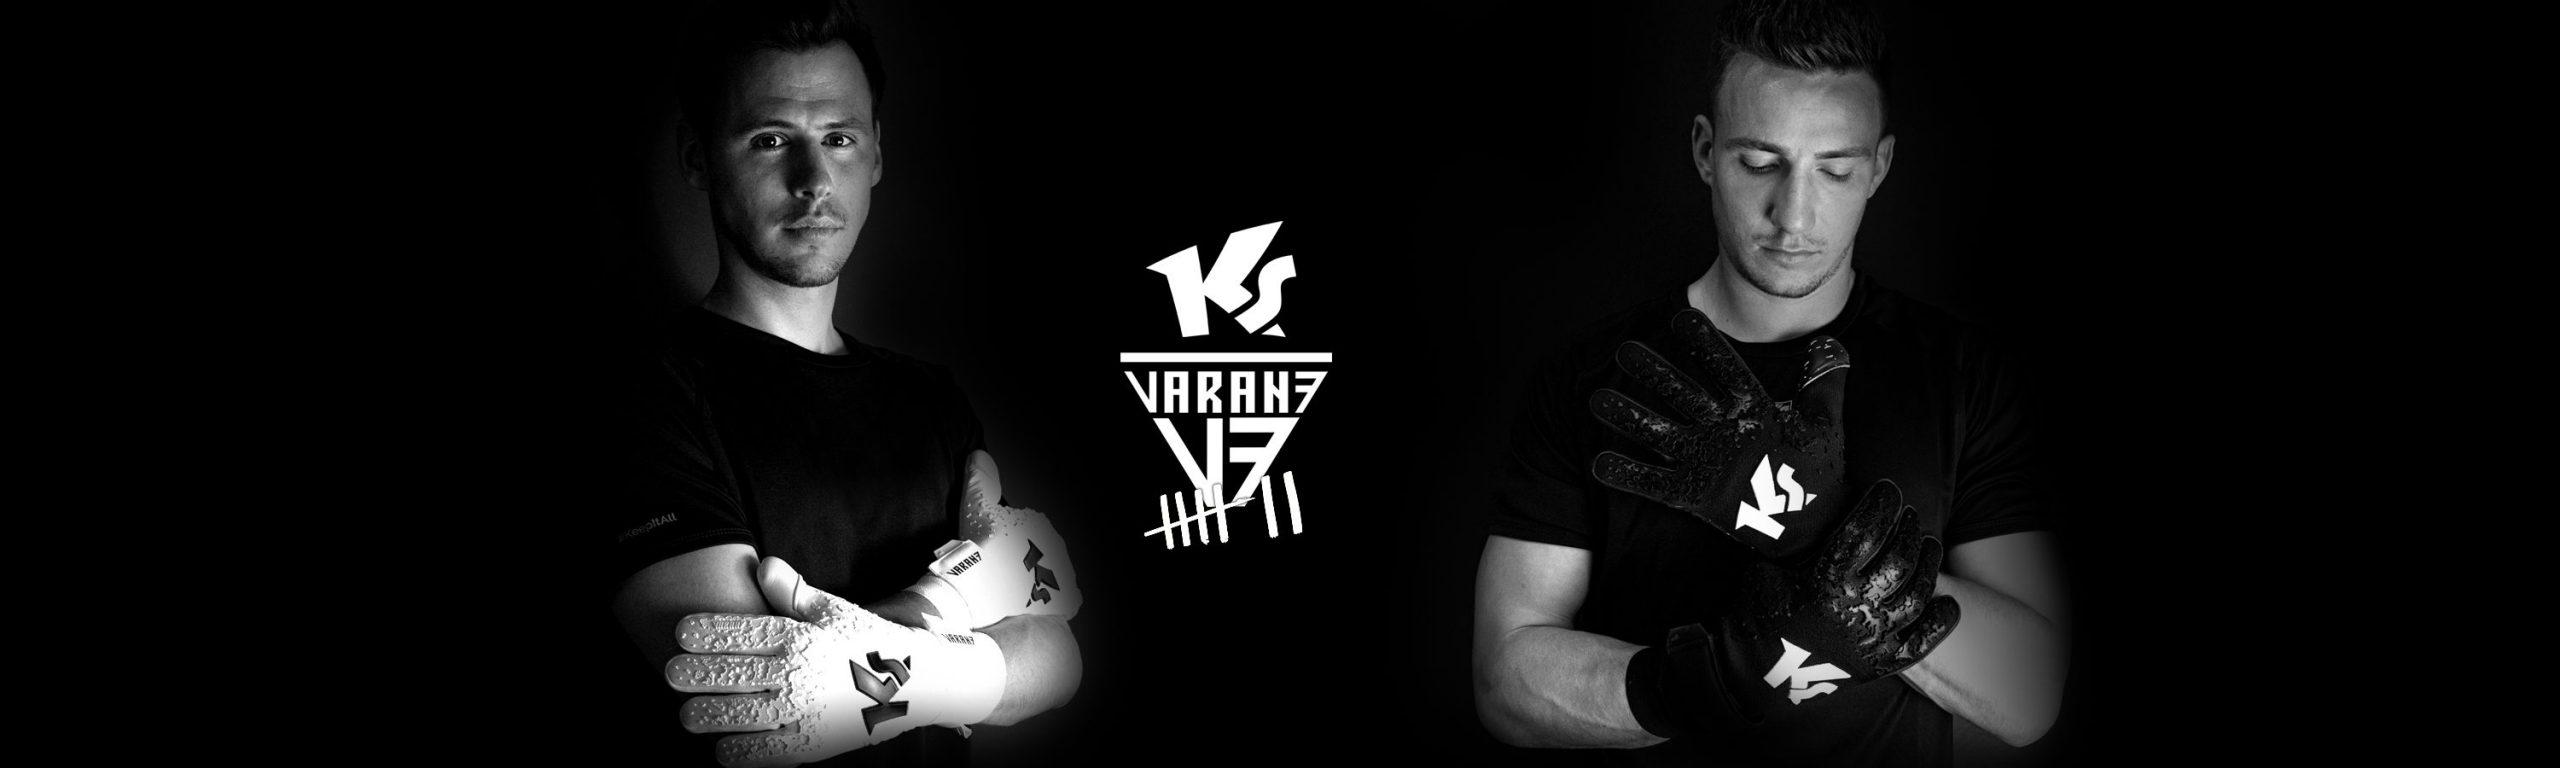 KEEPERsport Varan7